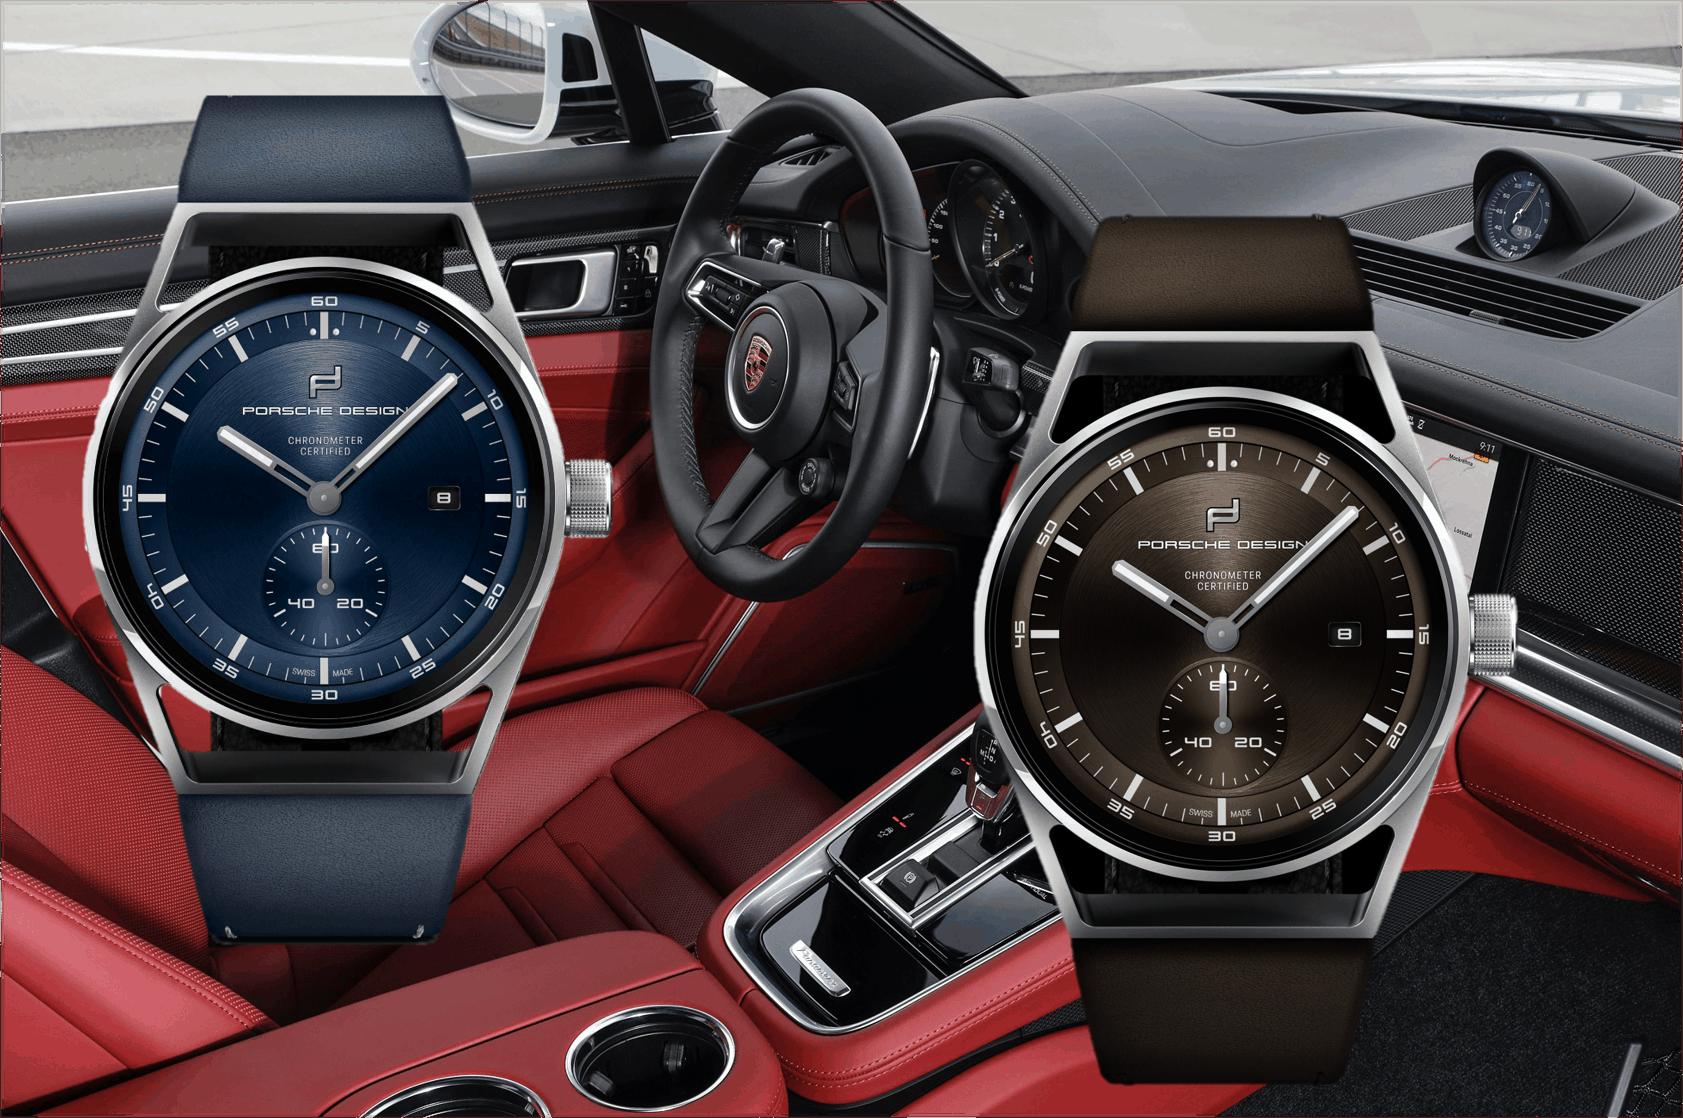 Farbvarianten des Porsche Design Sport Chrono Subsecond